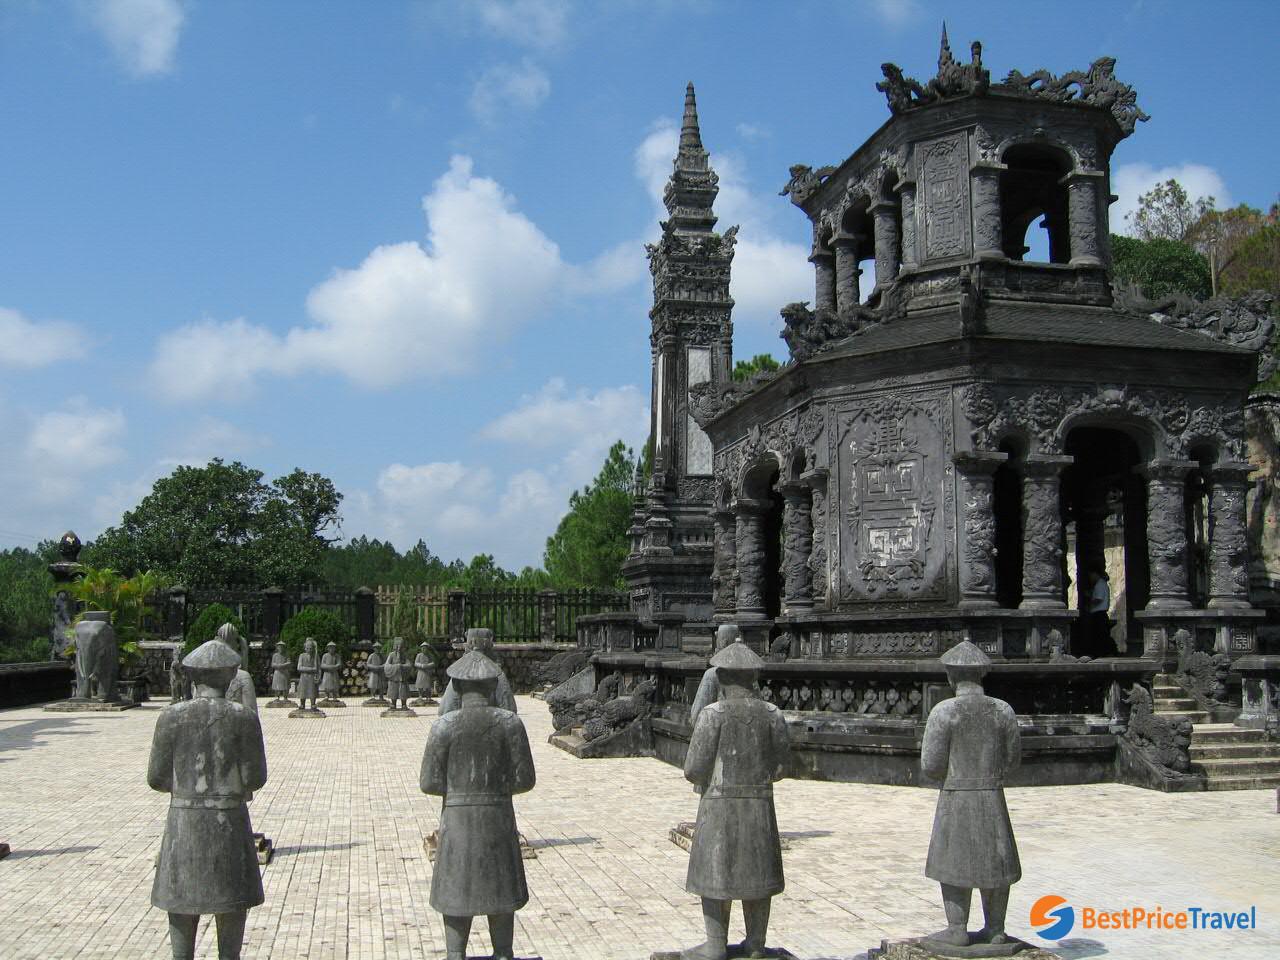 Inside Khai Dinh